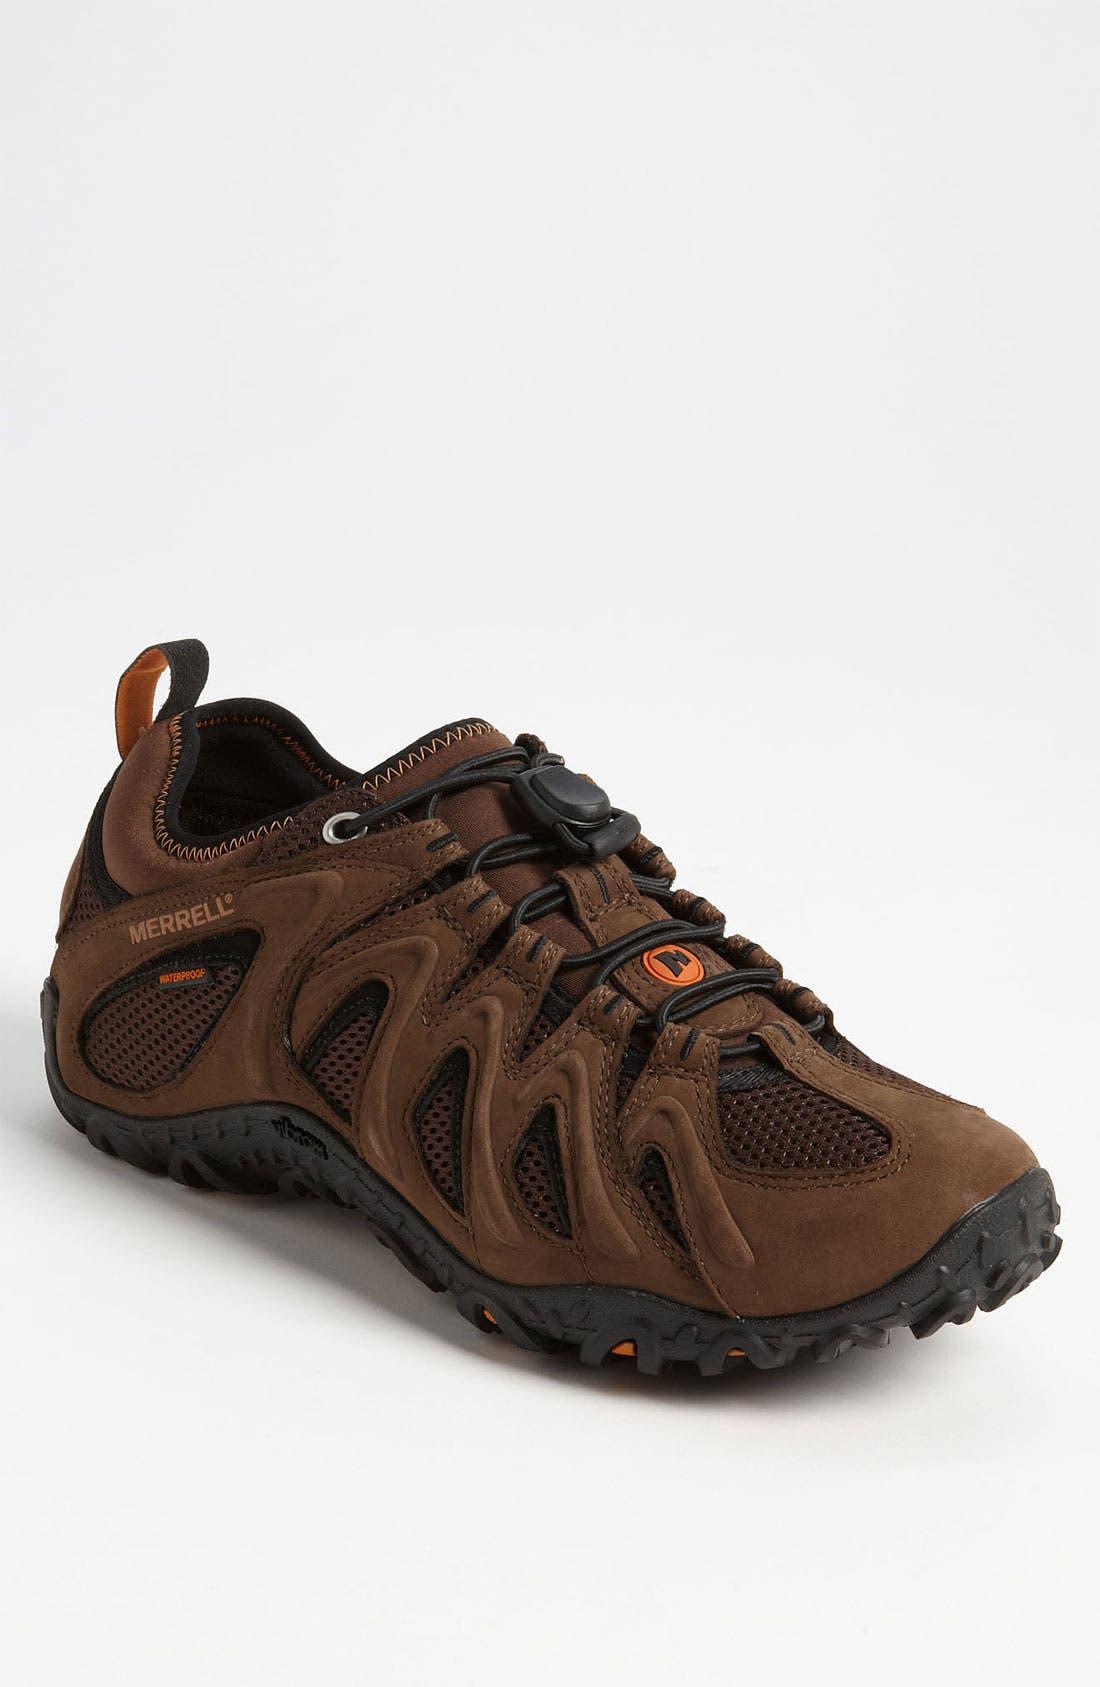 Main Image - Merrell 'Chameleon 4 Stretch' Waterproof Hiking Shoe (Men)